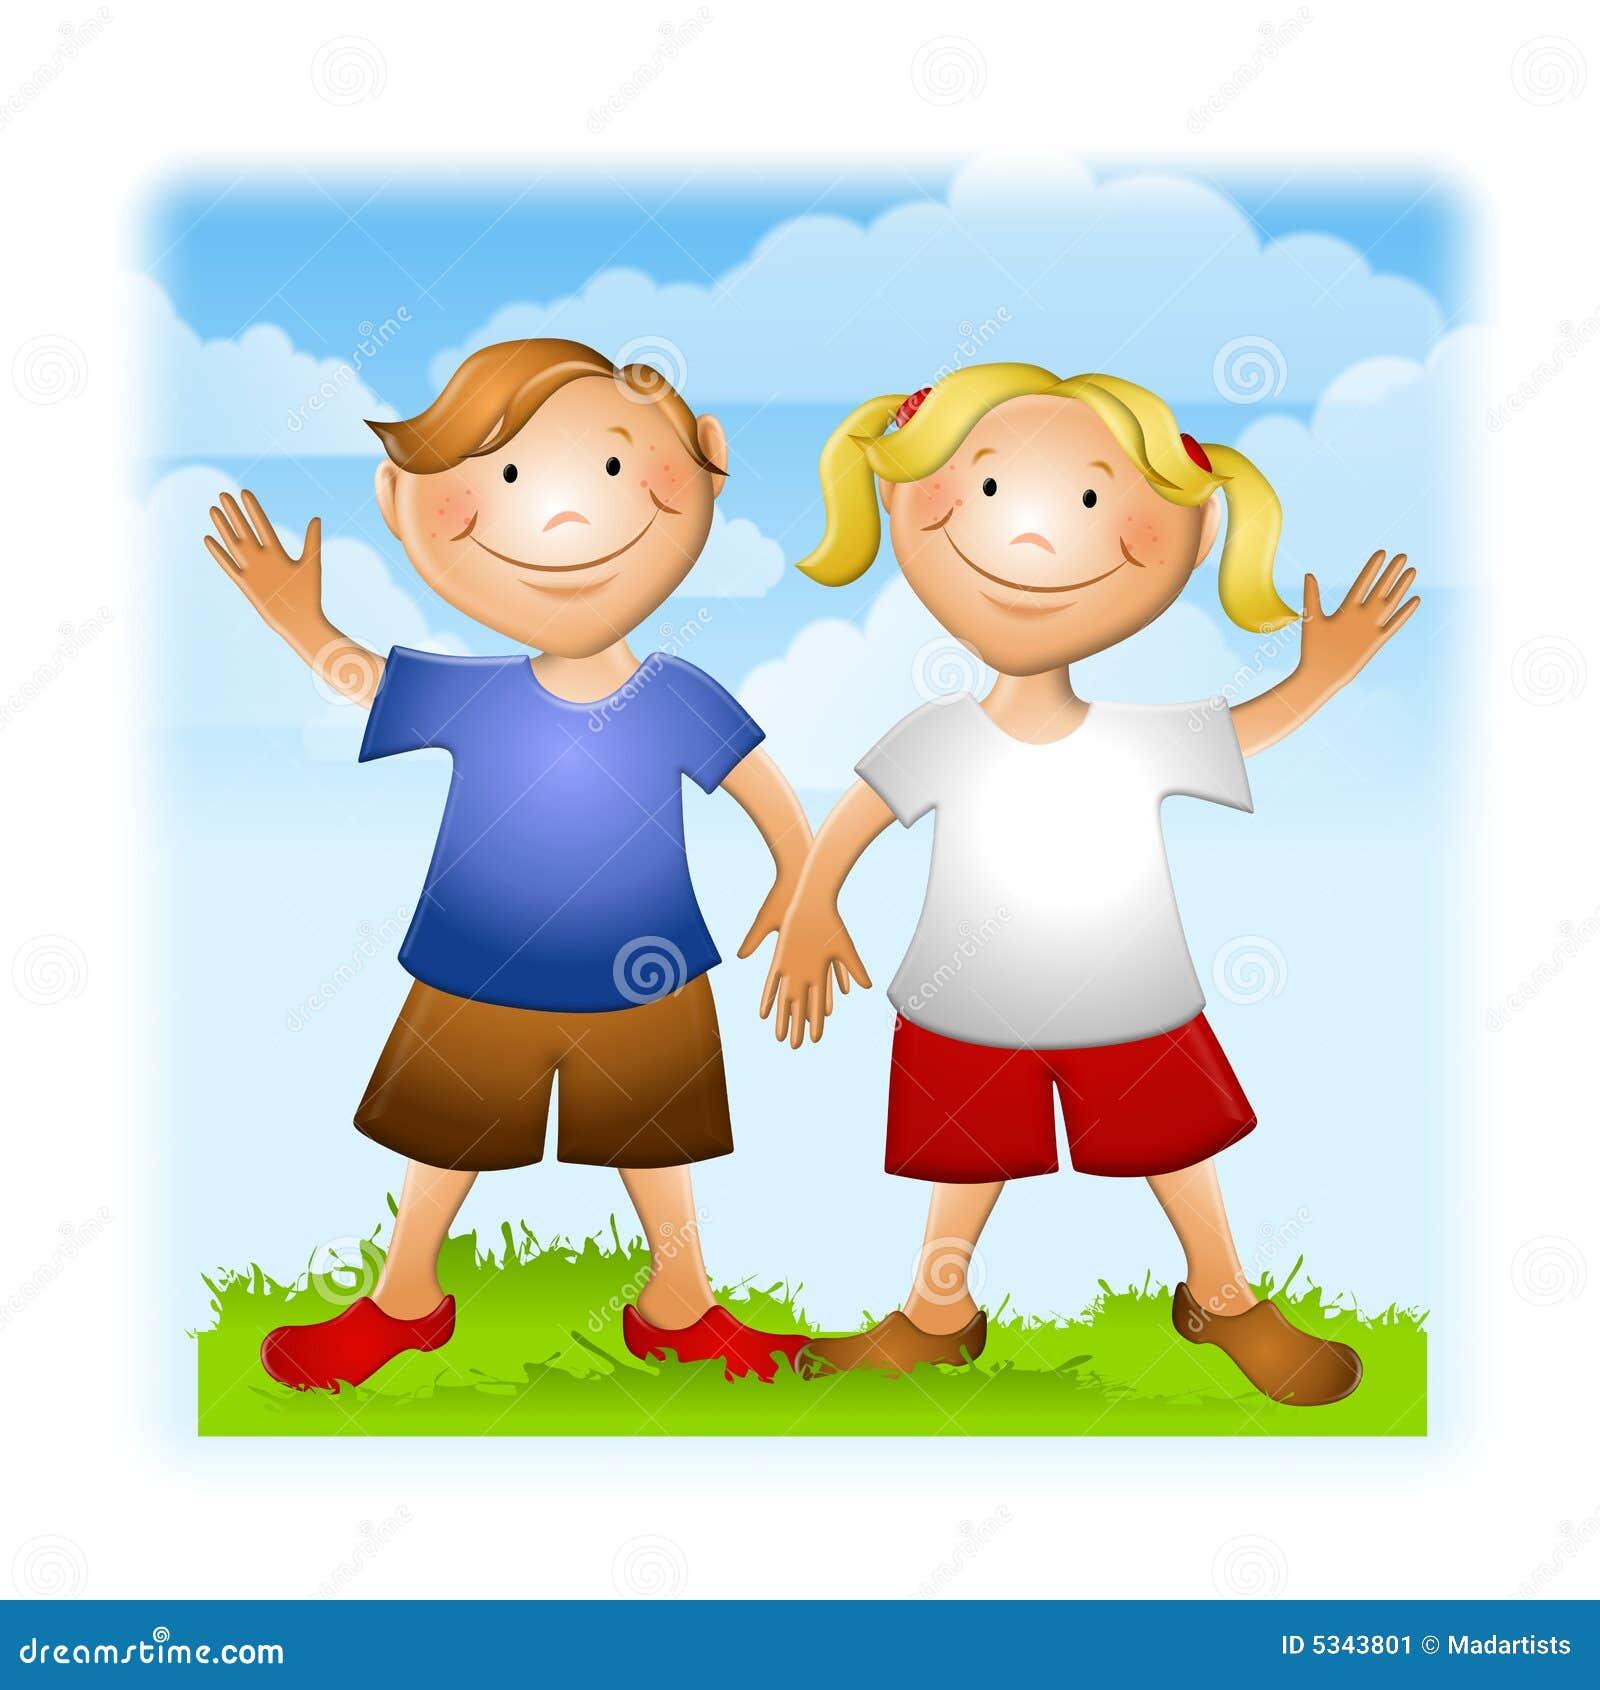 summer kids holding hands waving stock image image 5343801